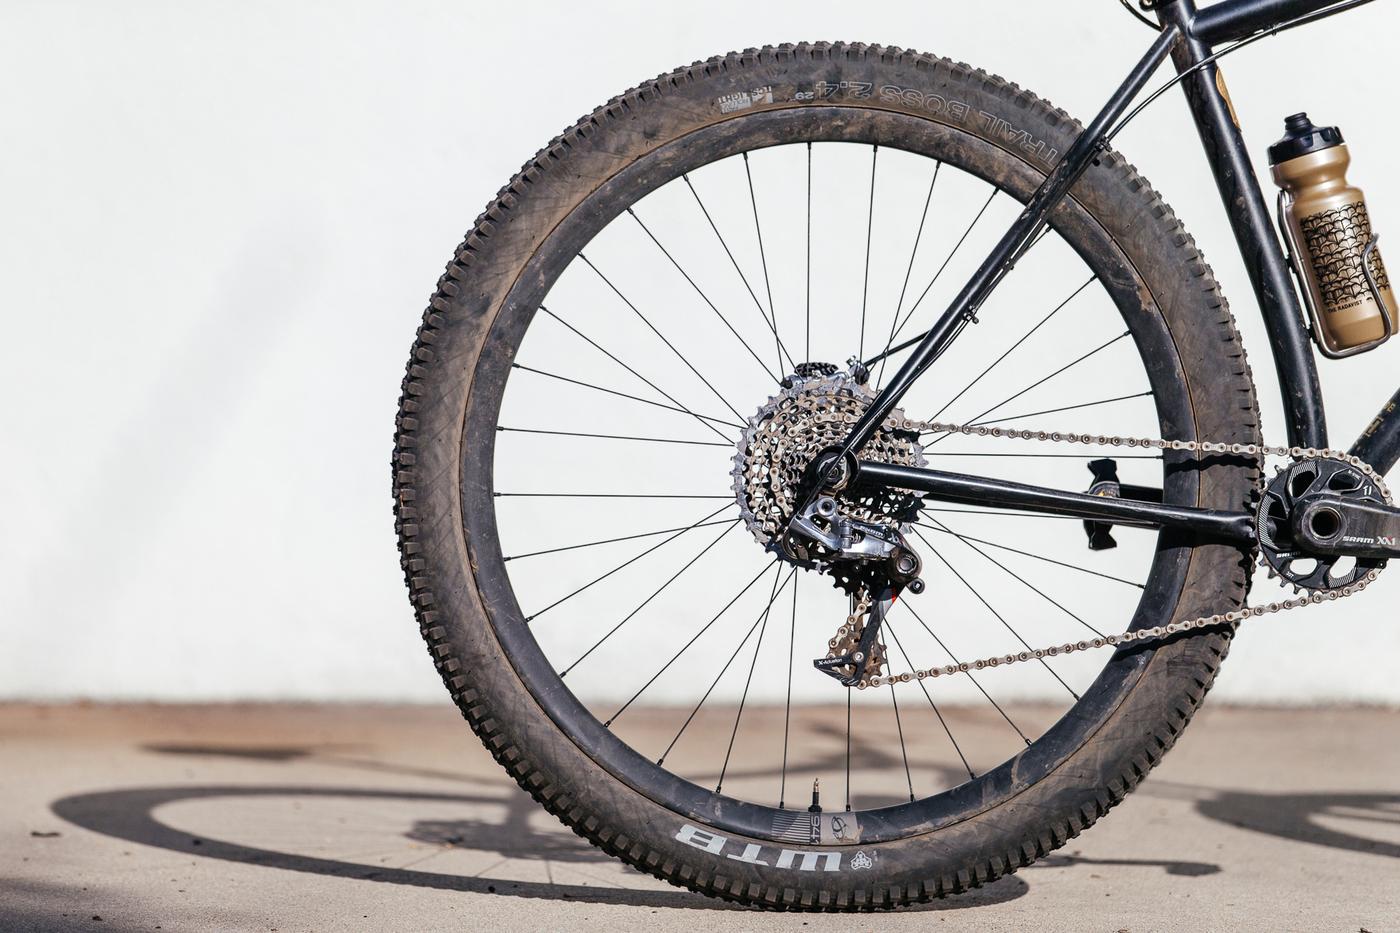 My 44 Bikes Marauder Hardtail is Steady Shreddin on Ibis 741 Wheels